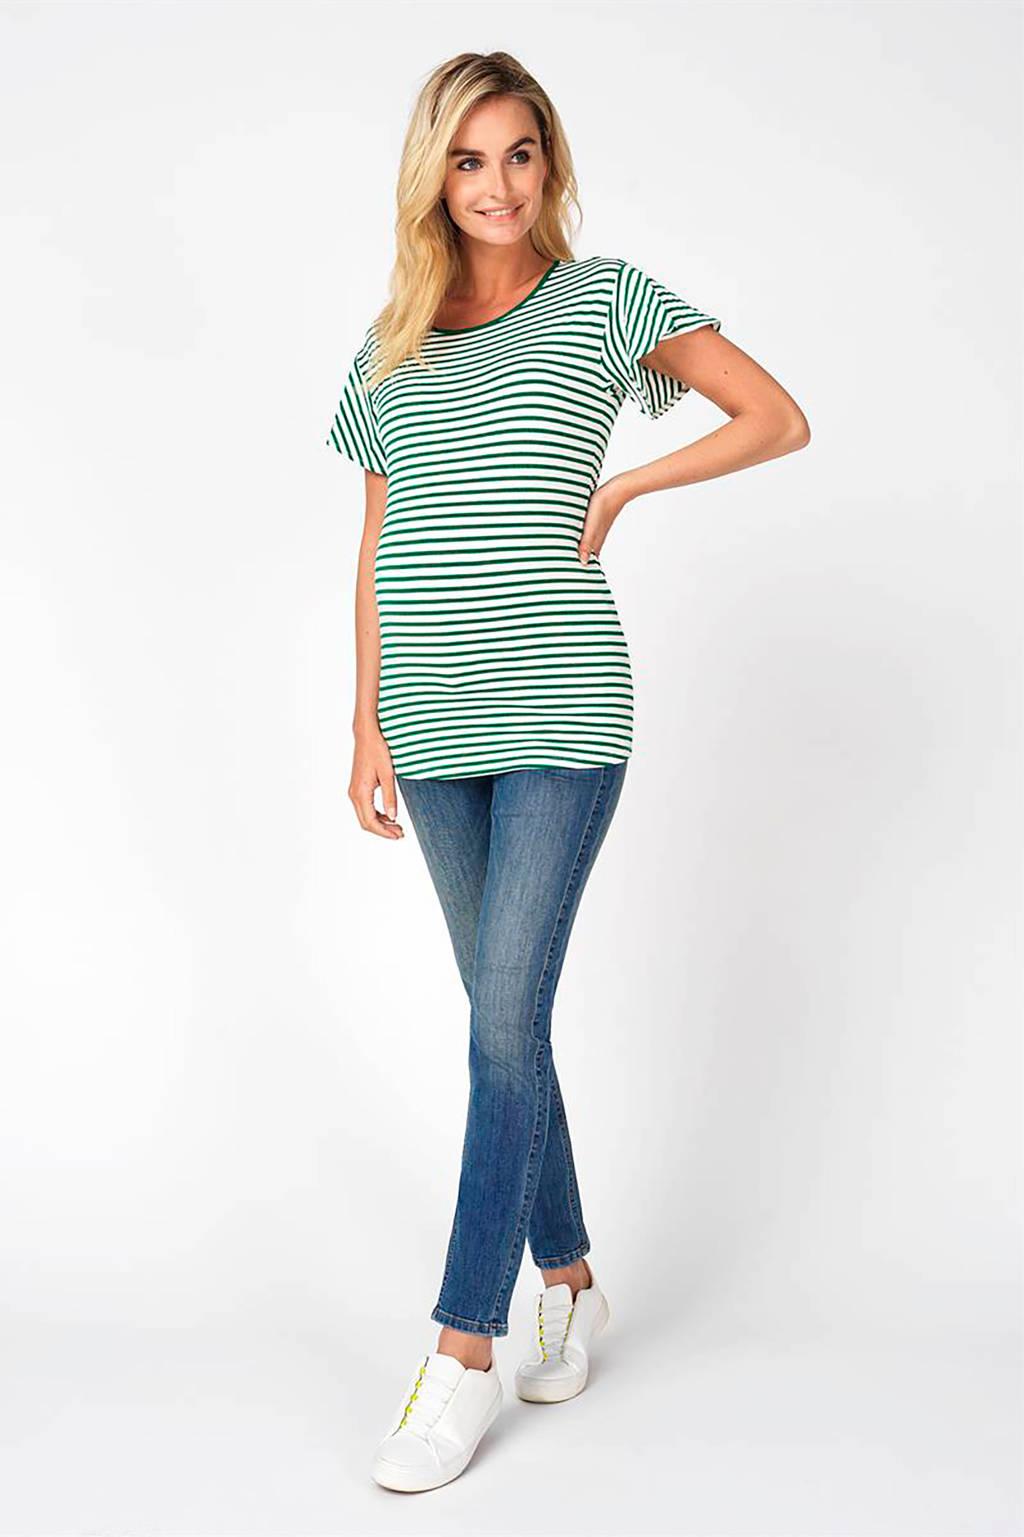 Noppies low waist skinny zwangerschapsjeans Avi blauw/ groen, 30